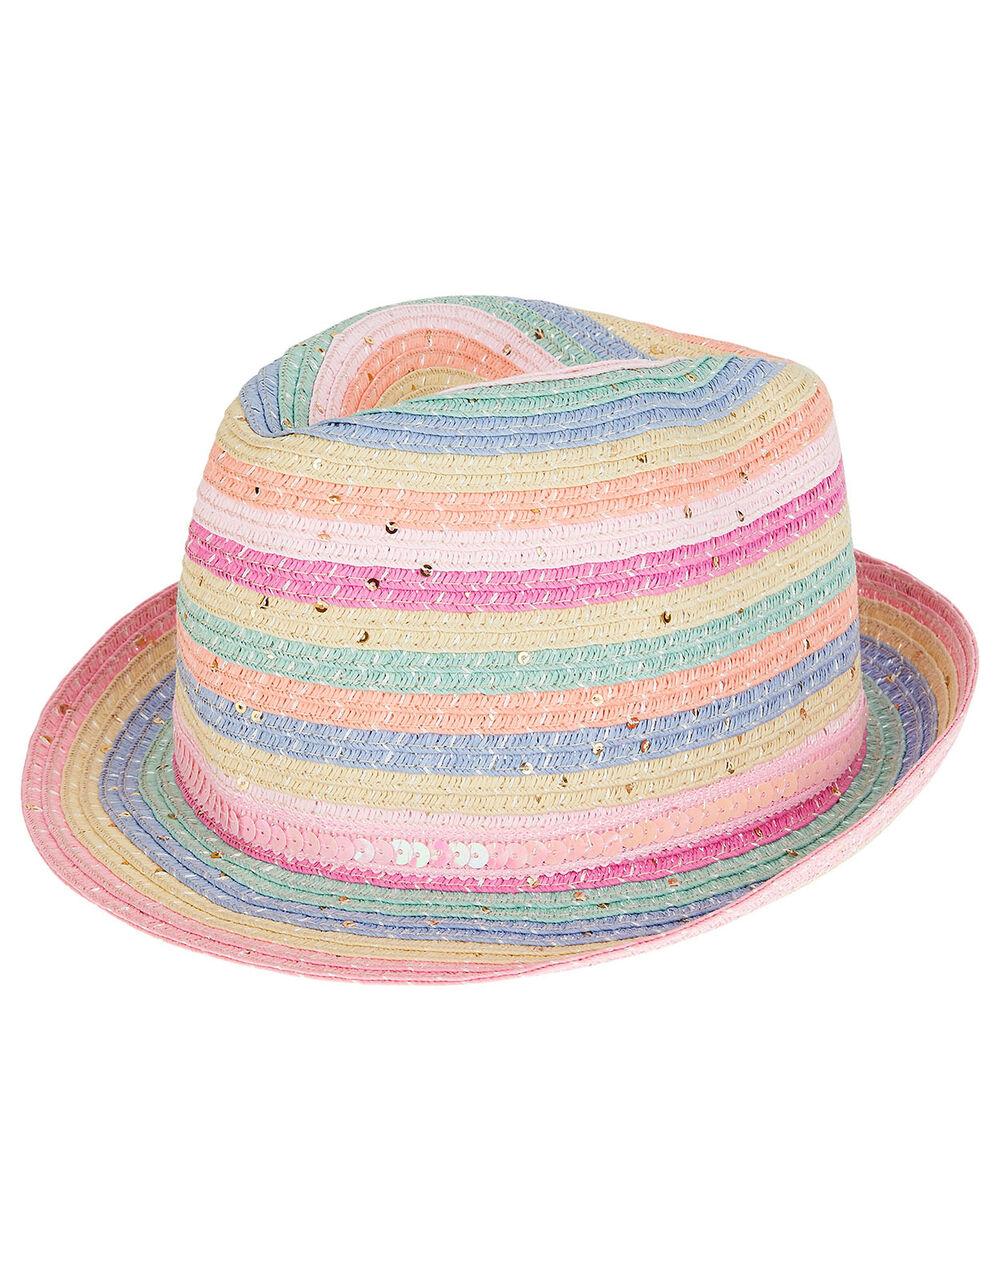 Rainbow Sequin Trilby Hat, Multi (MULTI), large